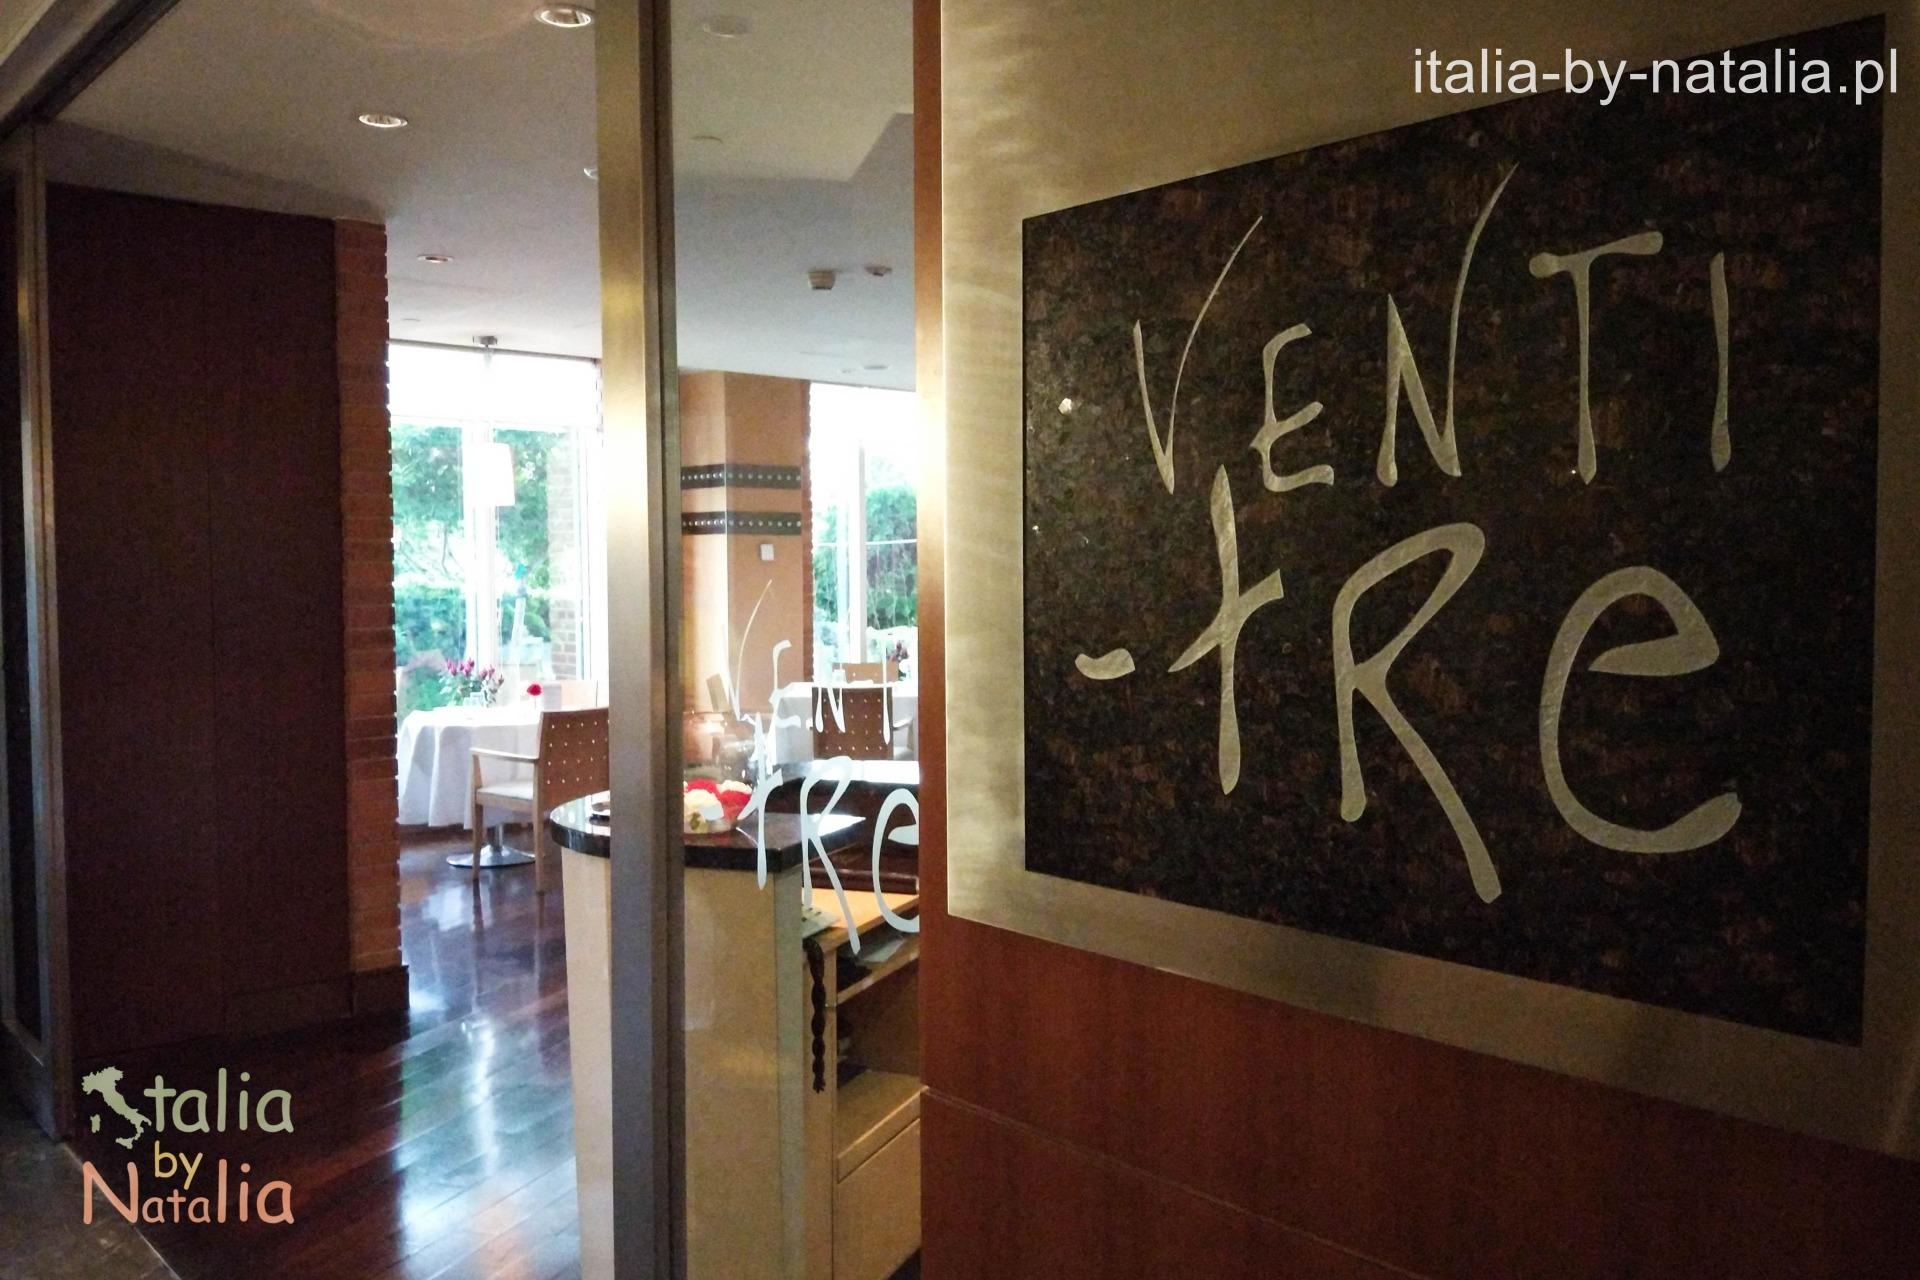 Hotel Regent Warsaw Venti-Tre Restaurant